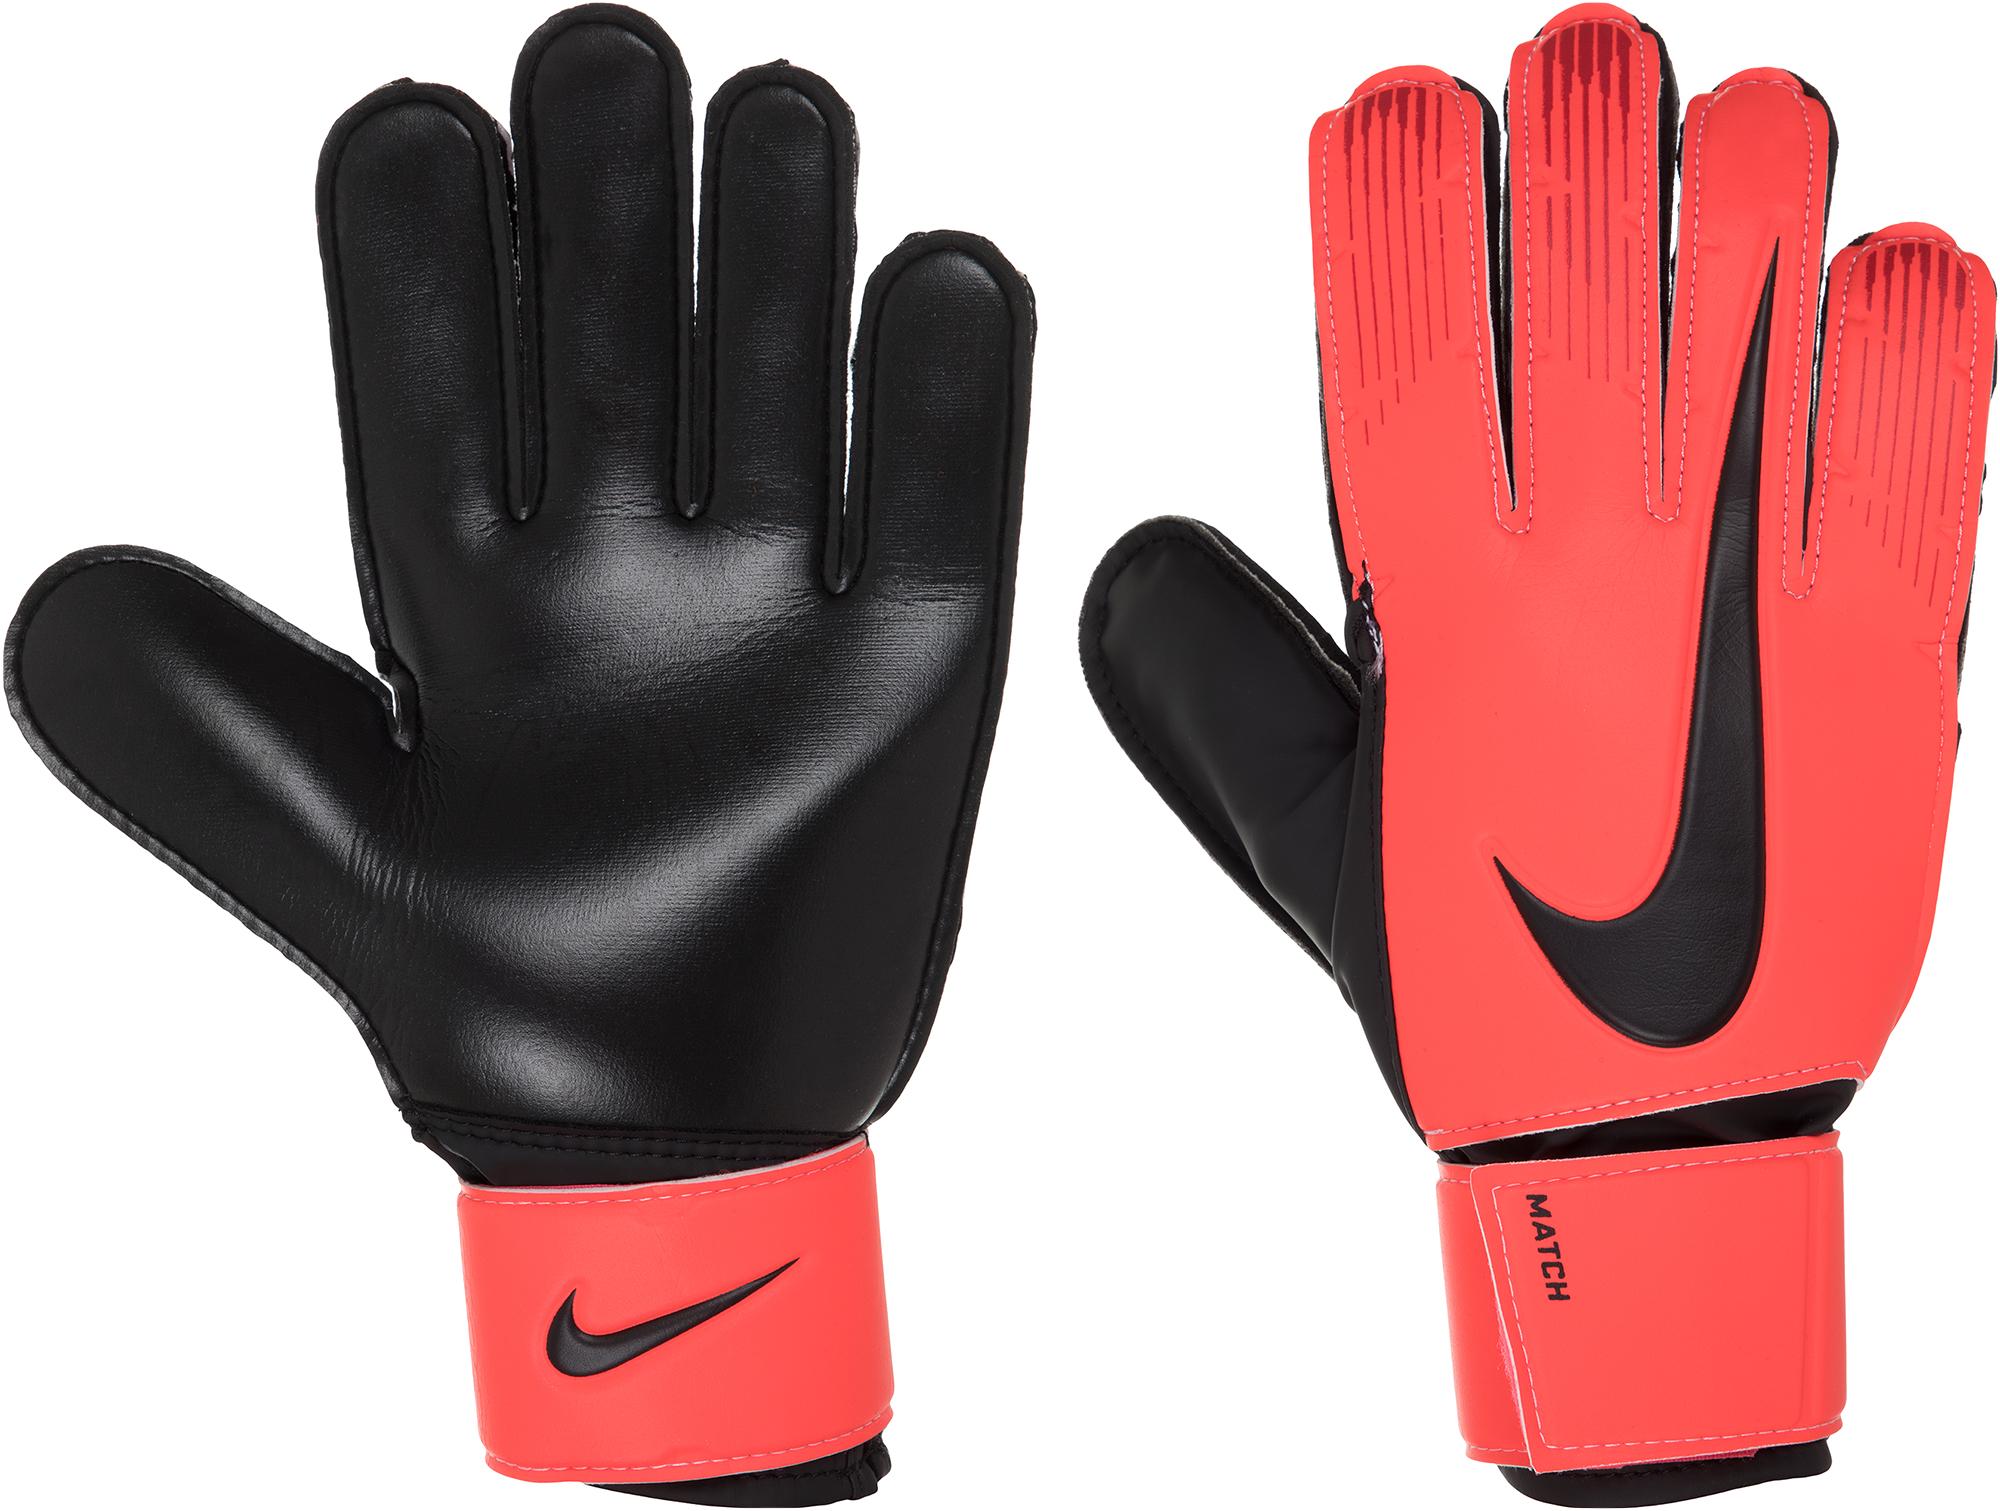 d740b90e Вратарские перчатки Nike - каталог цен, где купить в интернет ...